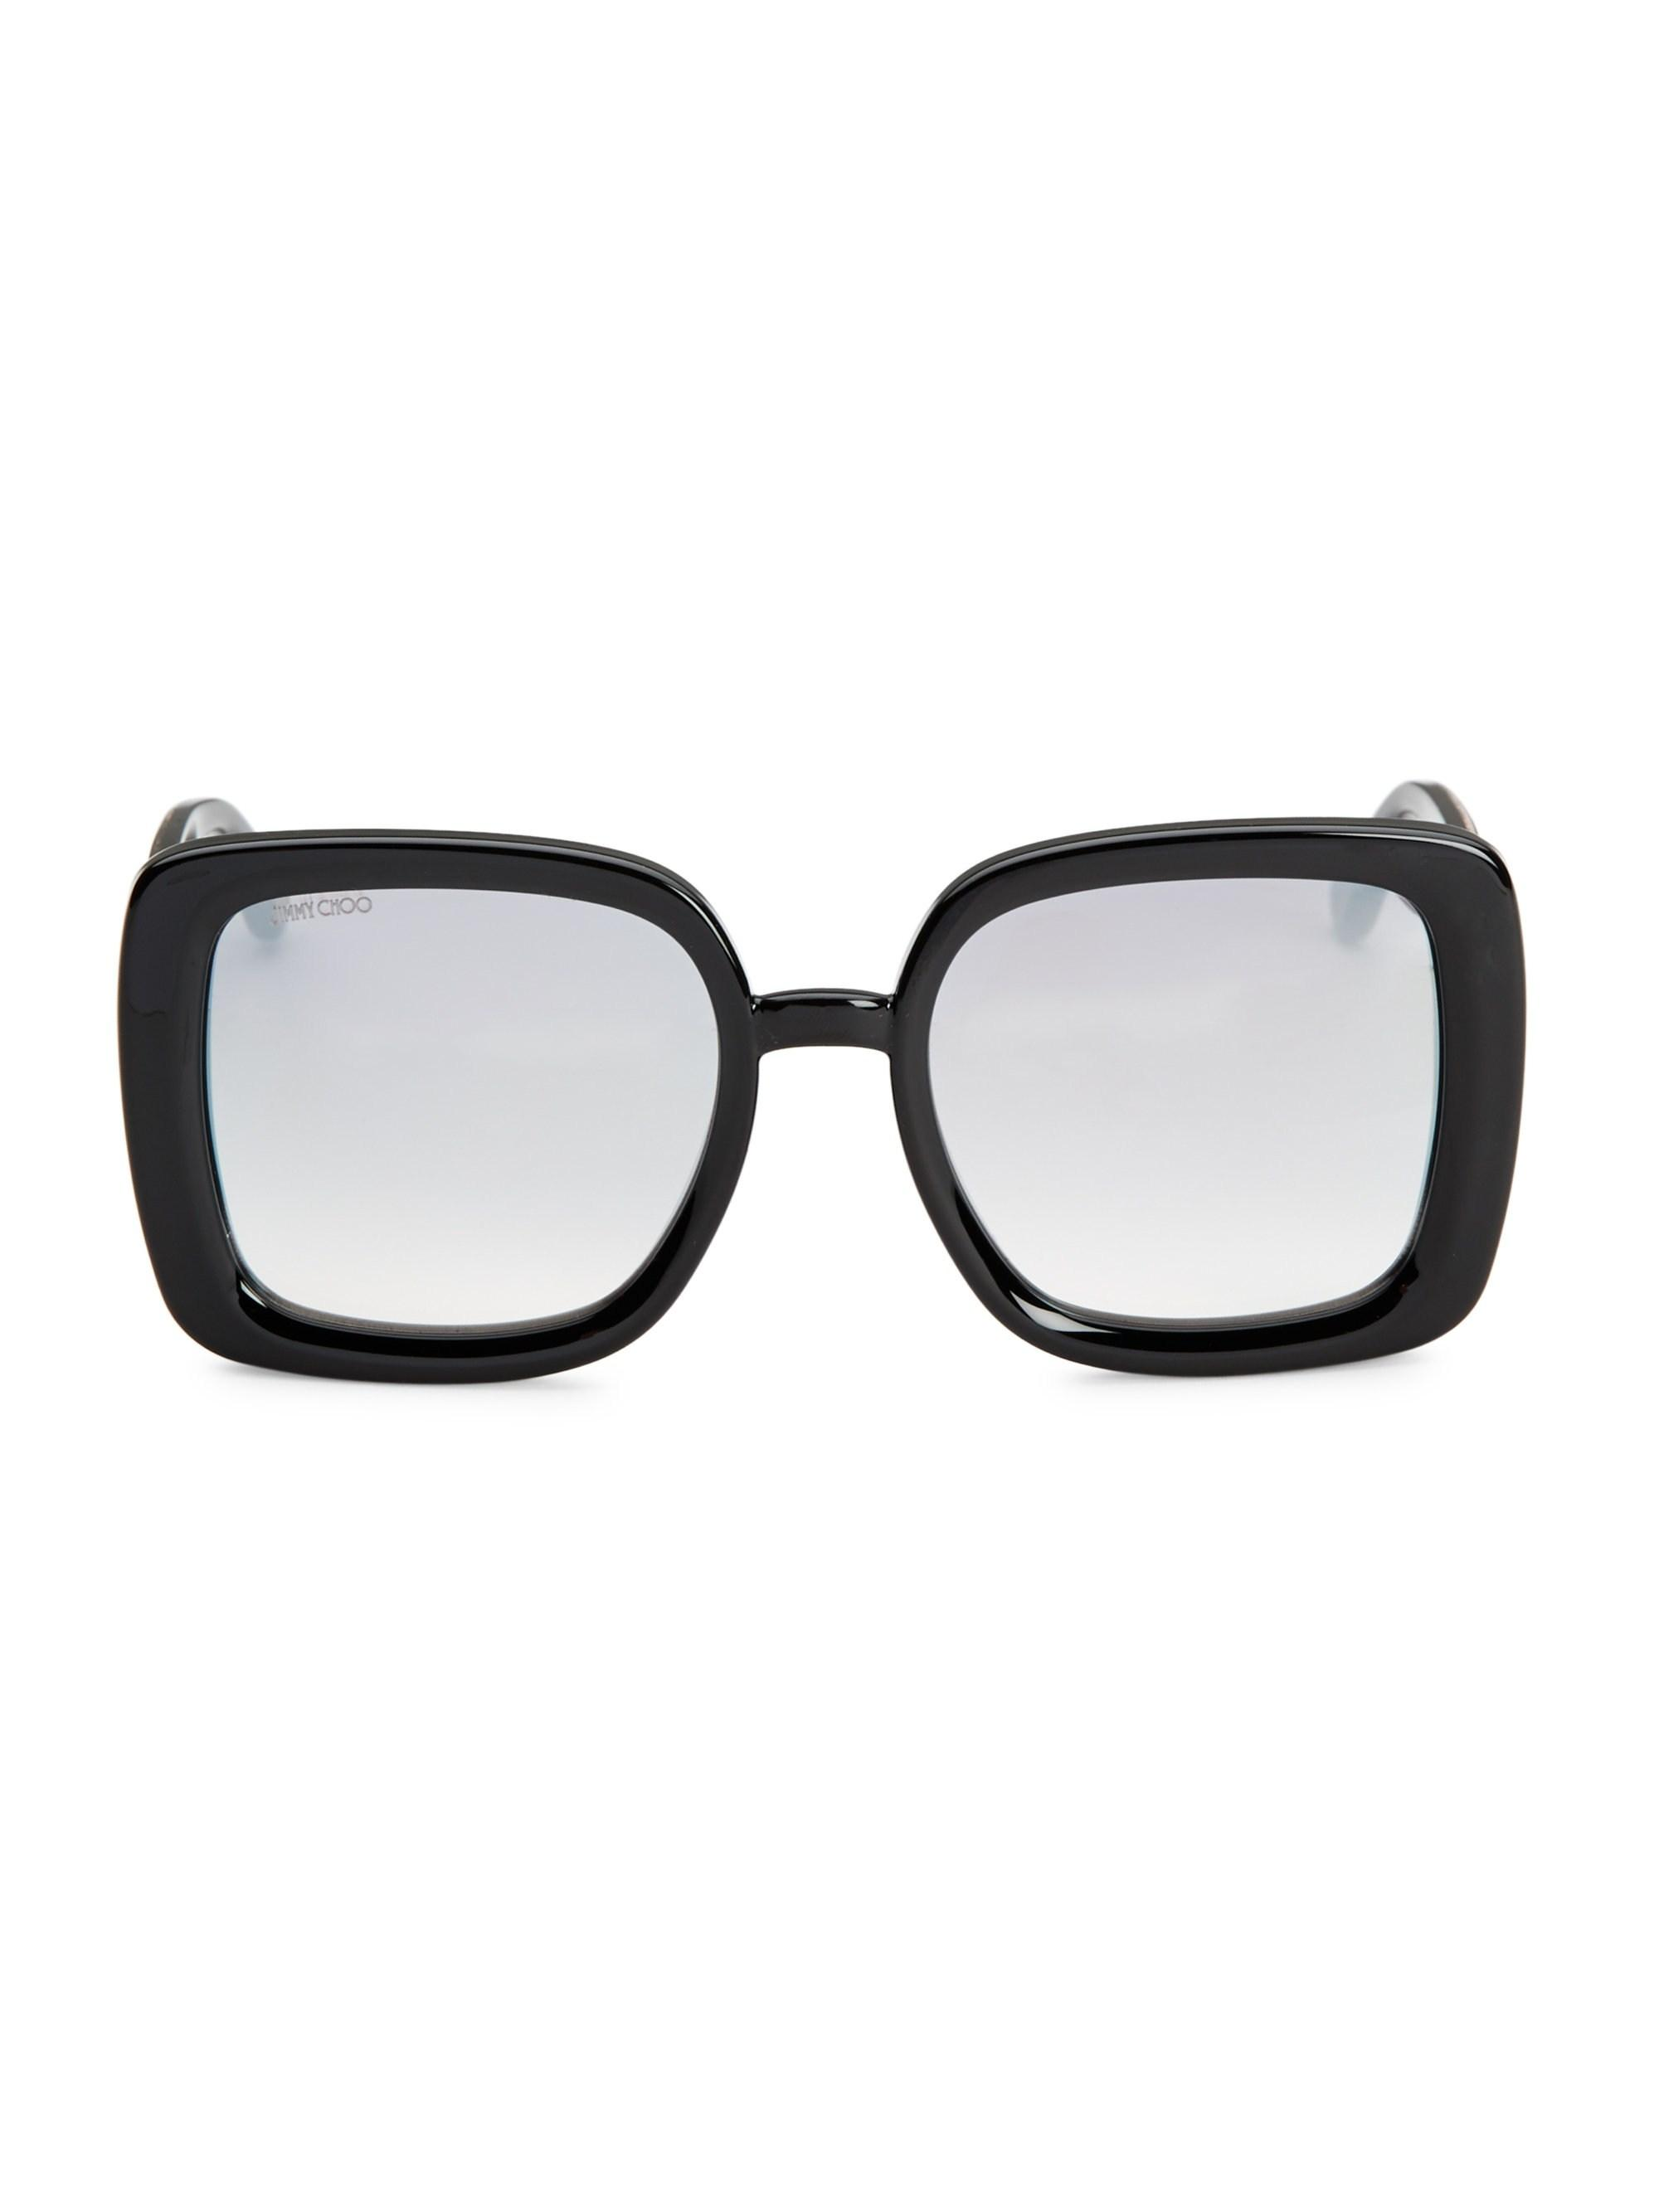 1df61cecfd5 Lyst - Jimmy Choo Women s 54mm Cait Square Sunglasses - Black ...